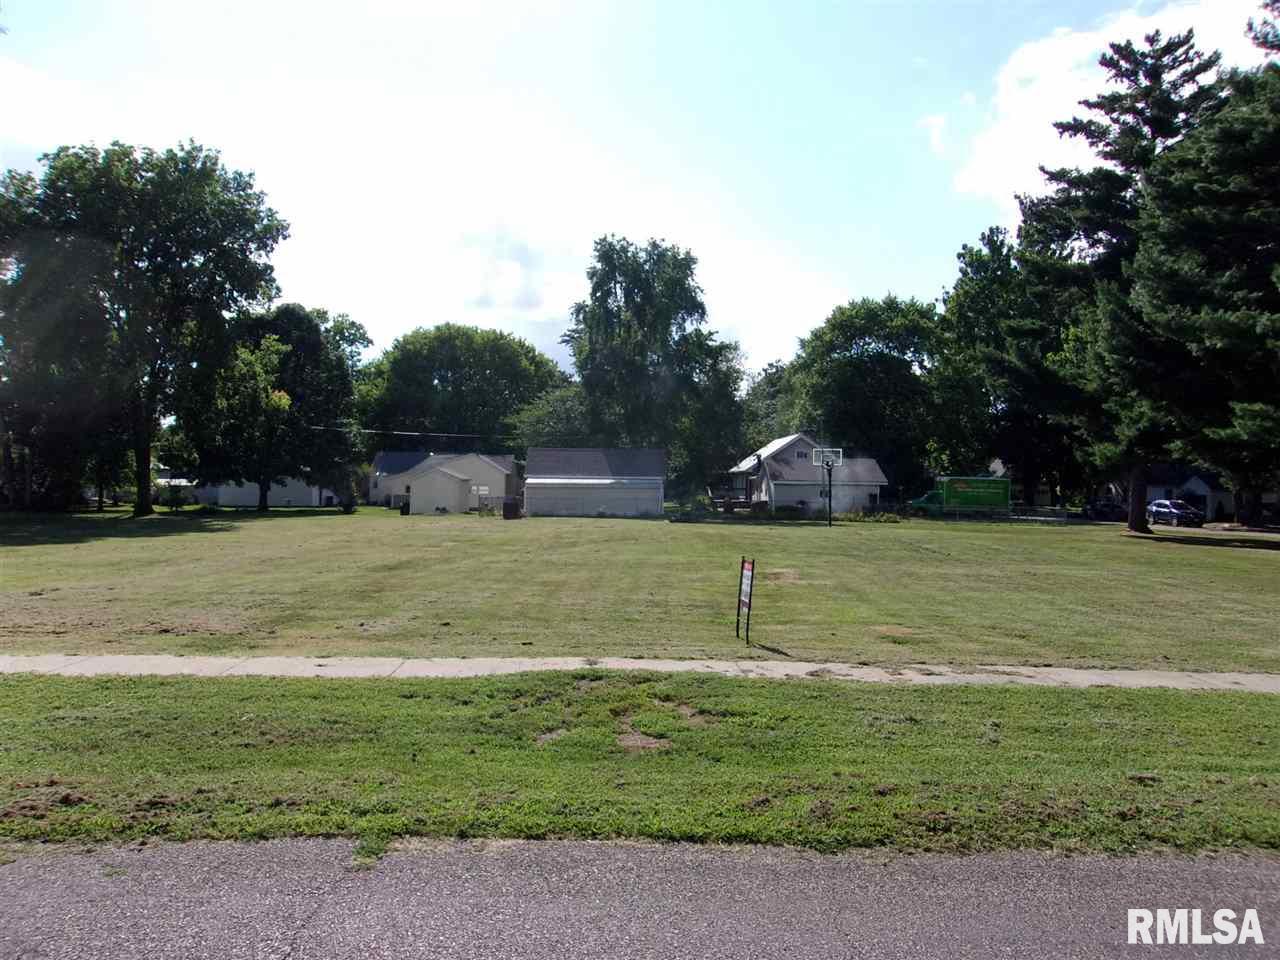 201 S POLLARD Property Photo - Manito, IL real estate listing